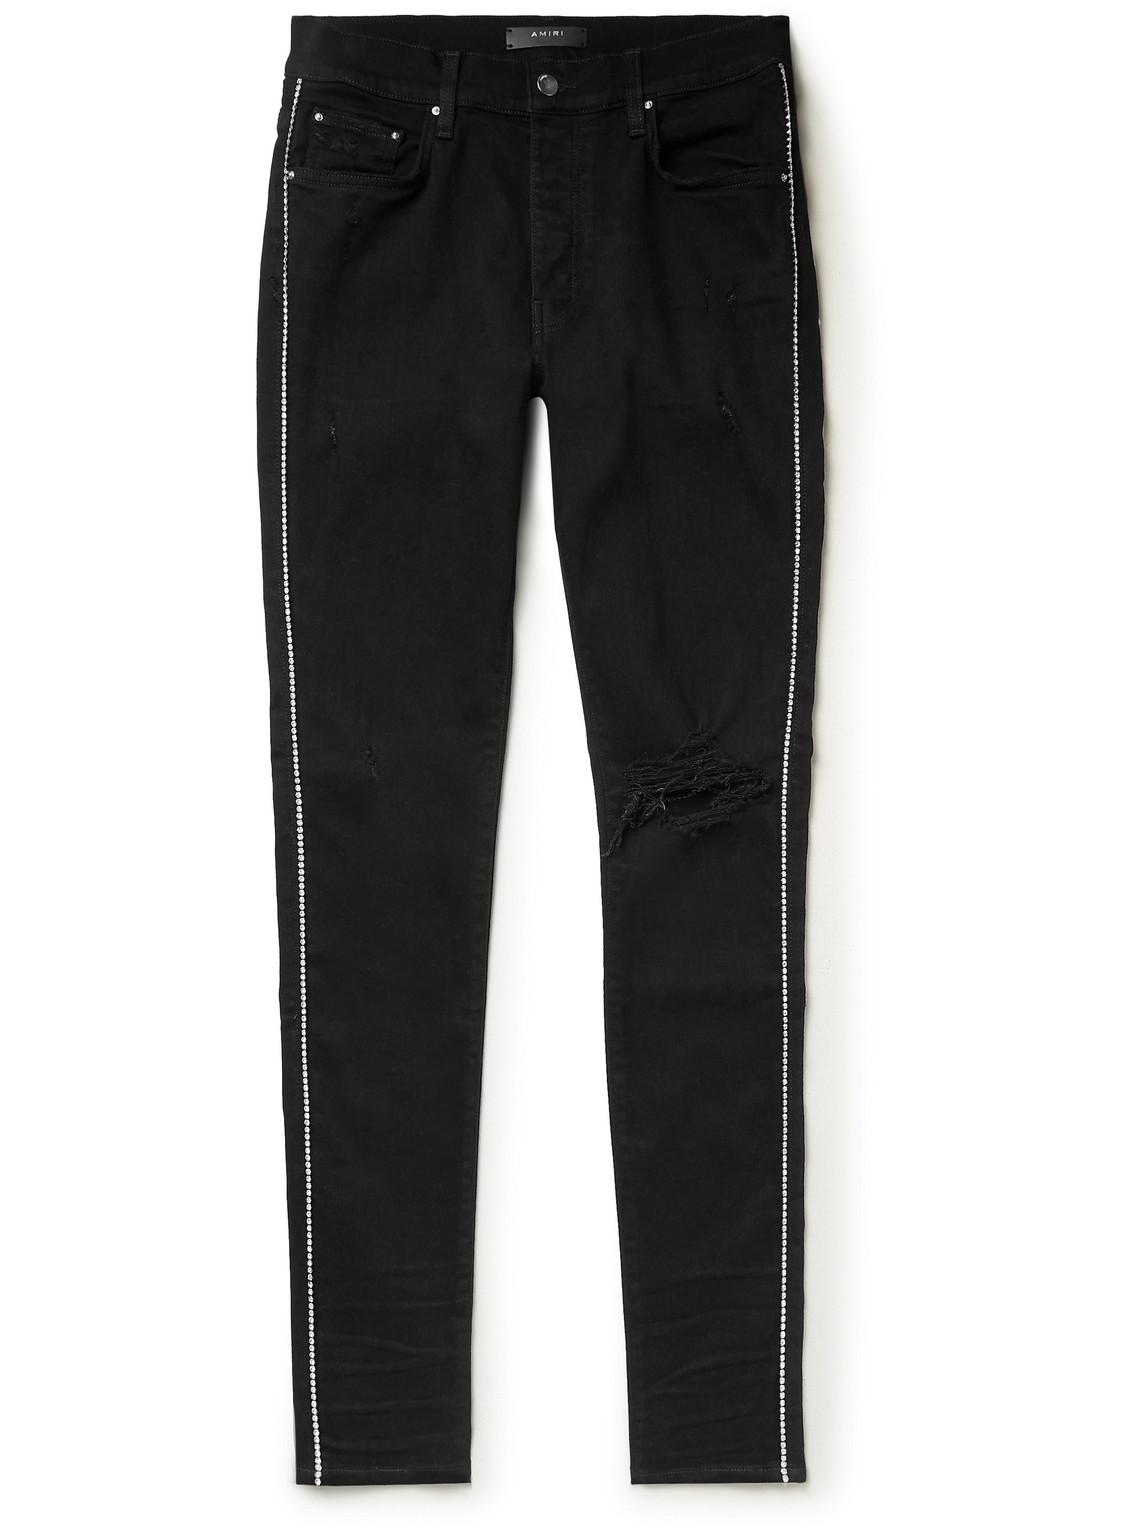 Skinny-Fit Distressed Crystal-Embellished Jeans